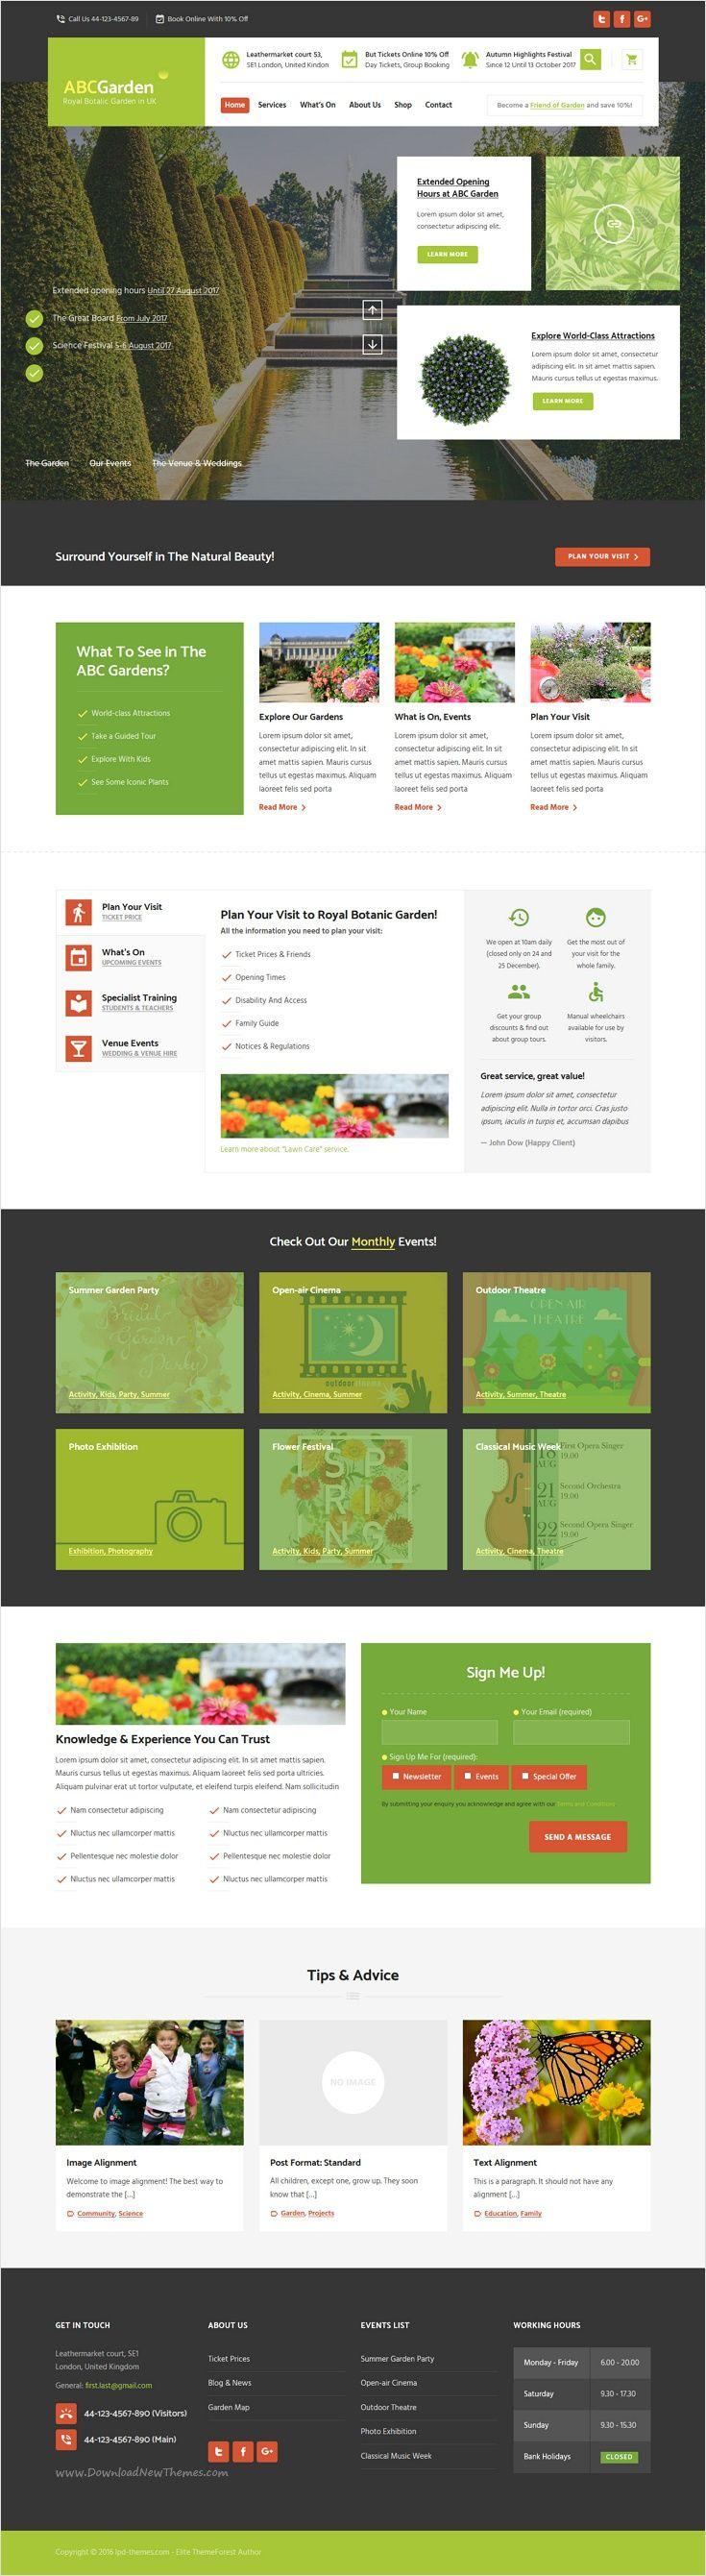 Abc Garden Is Beautifully Design Premium Wordpress Theme For Multipurpose Botanic Garden Events Park Websi Garden Design Layout Layout Design Garden Design